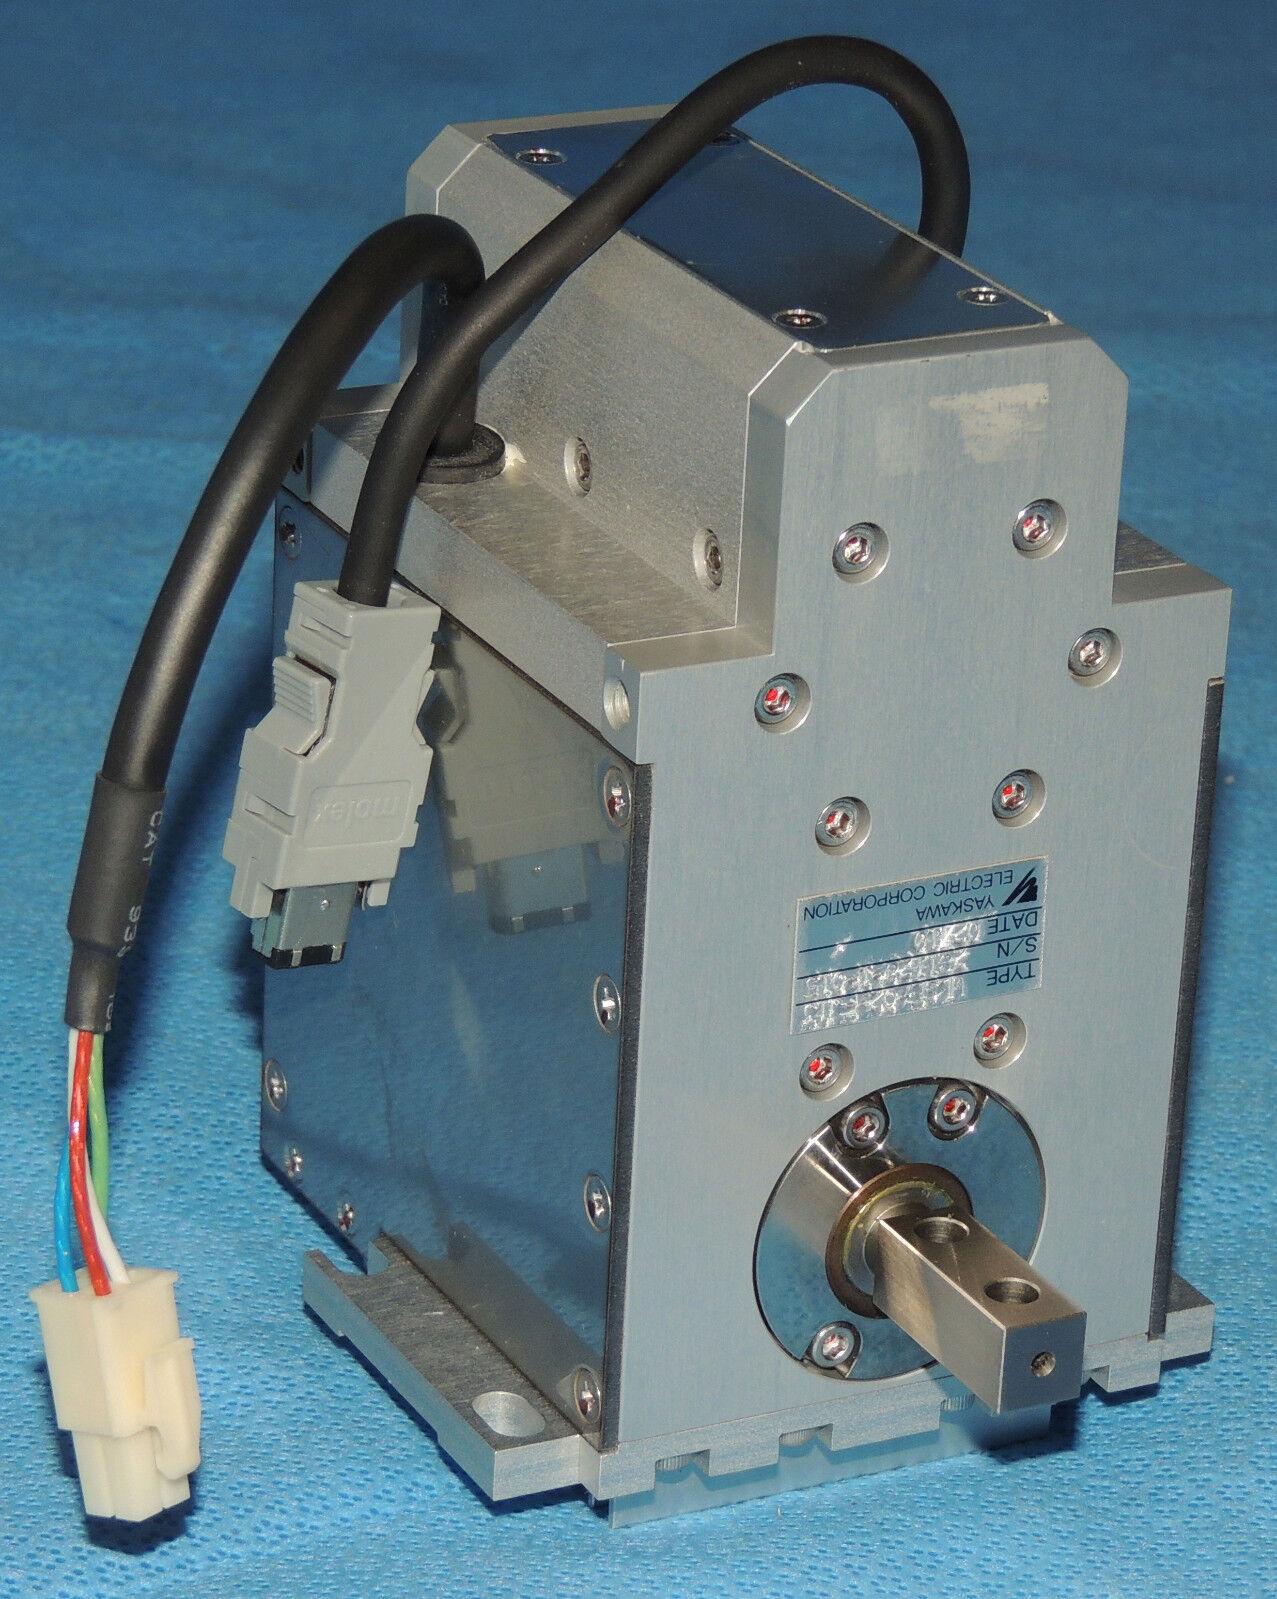 Phenomenal New Yaskawa Electric Ulse 02 Fj13 Servo Motor Warranty Actuator Wiring 101 Bdelwellnesstrialsorg